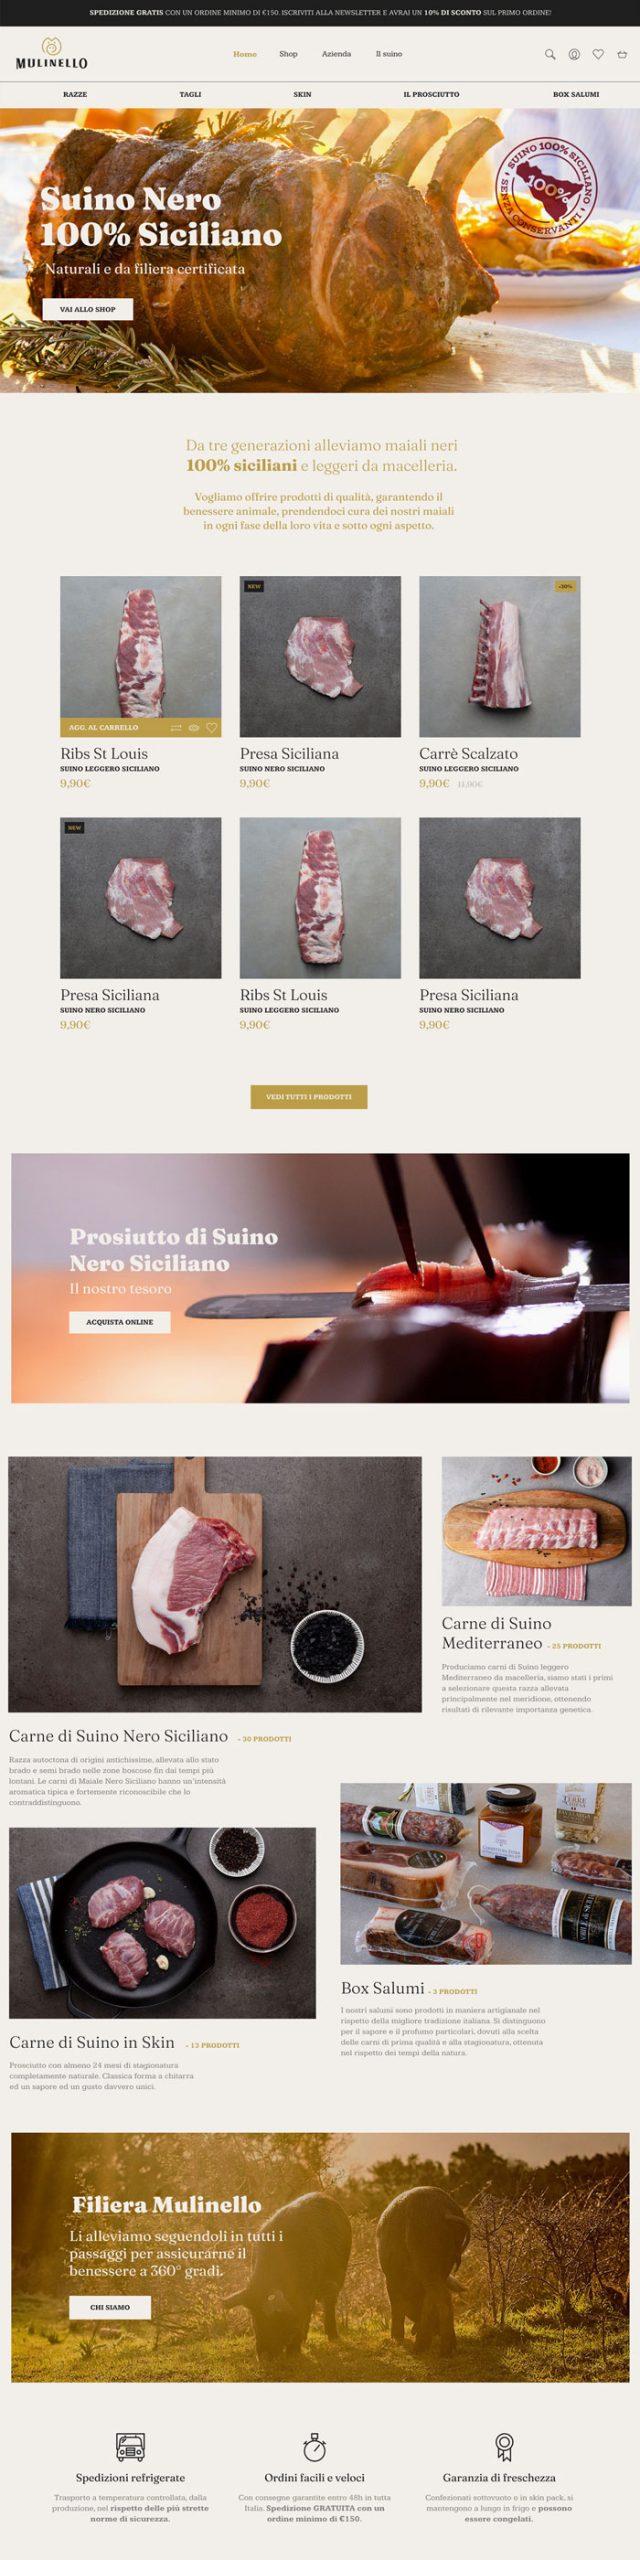 La Cook Portfolio Mulinello Website